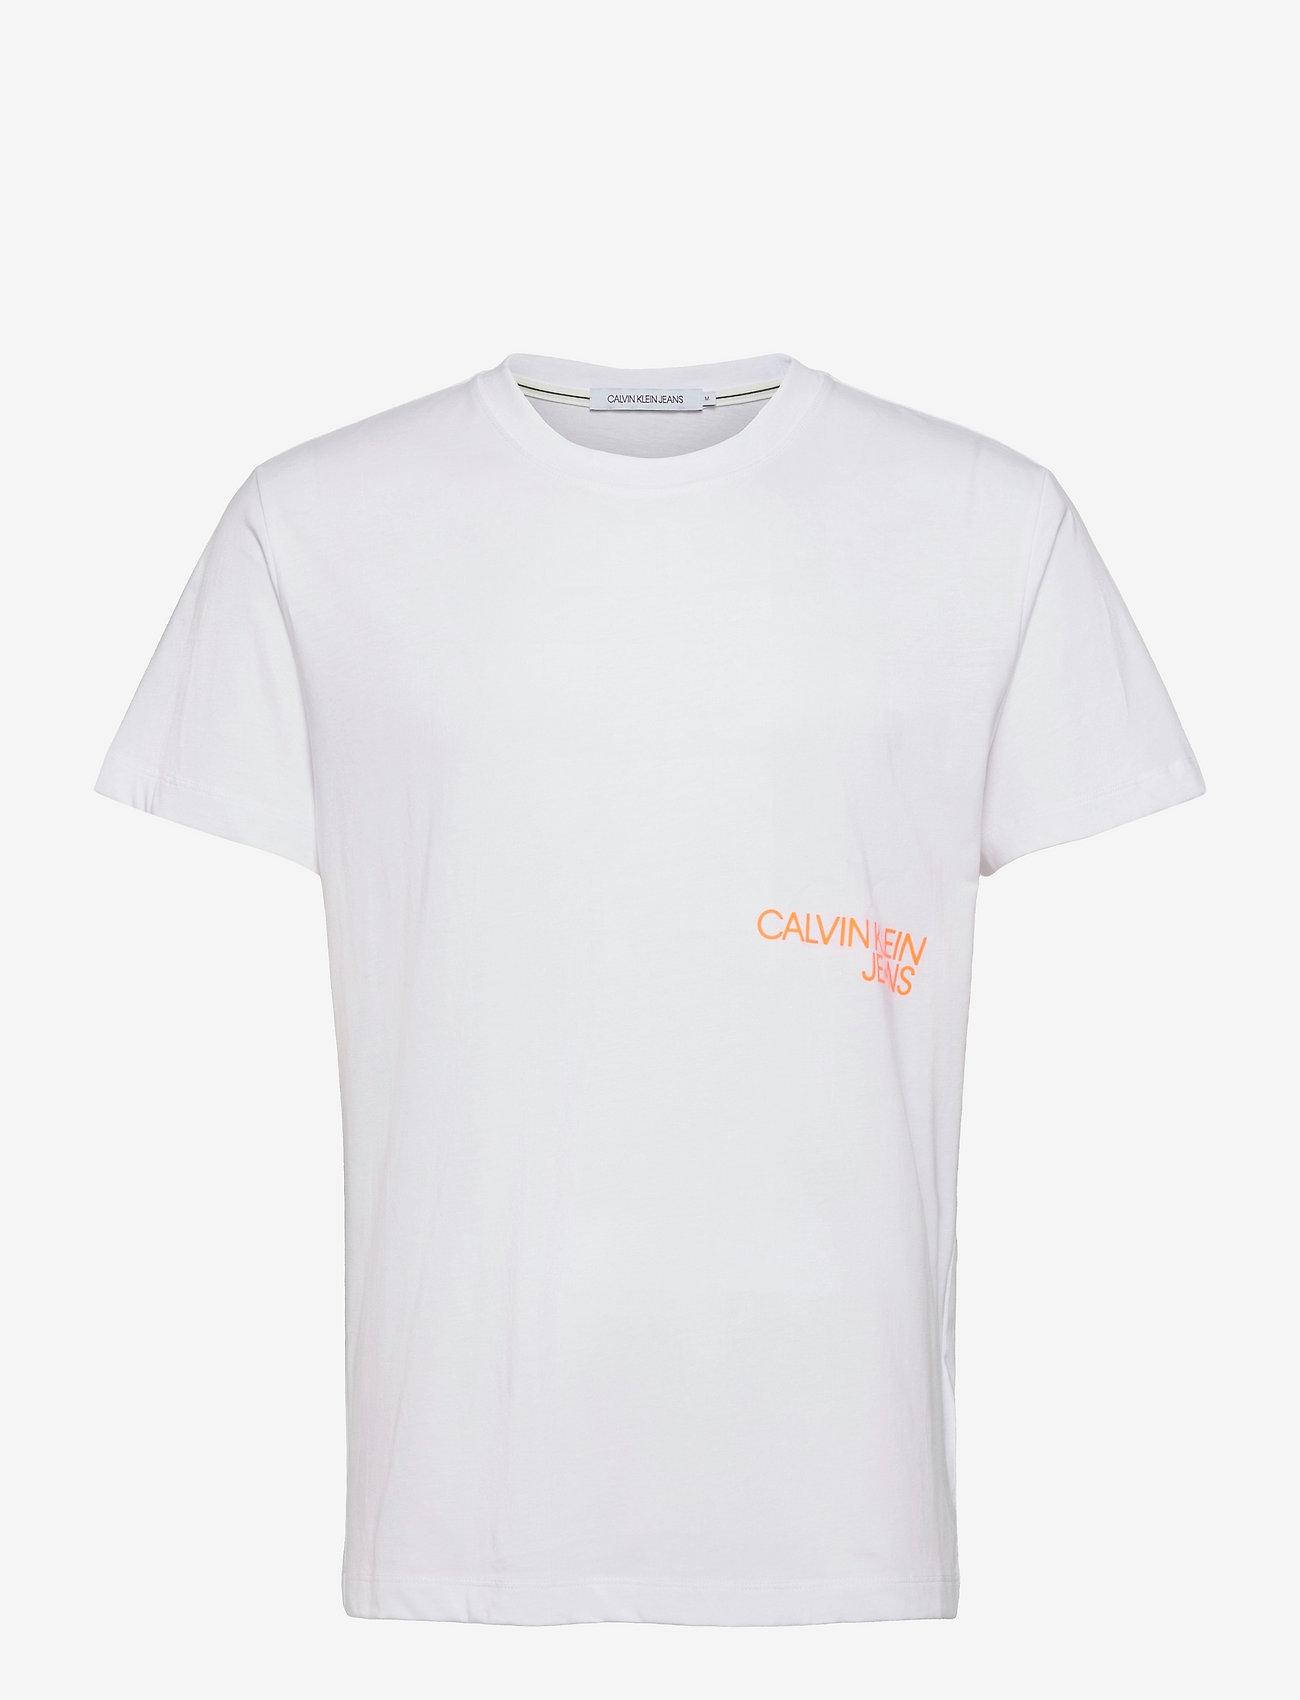 Calvin Klein Jeans - CK MONOGRAM CLEAR PRINT TEE - t-shirts basiques - bright white - 0